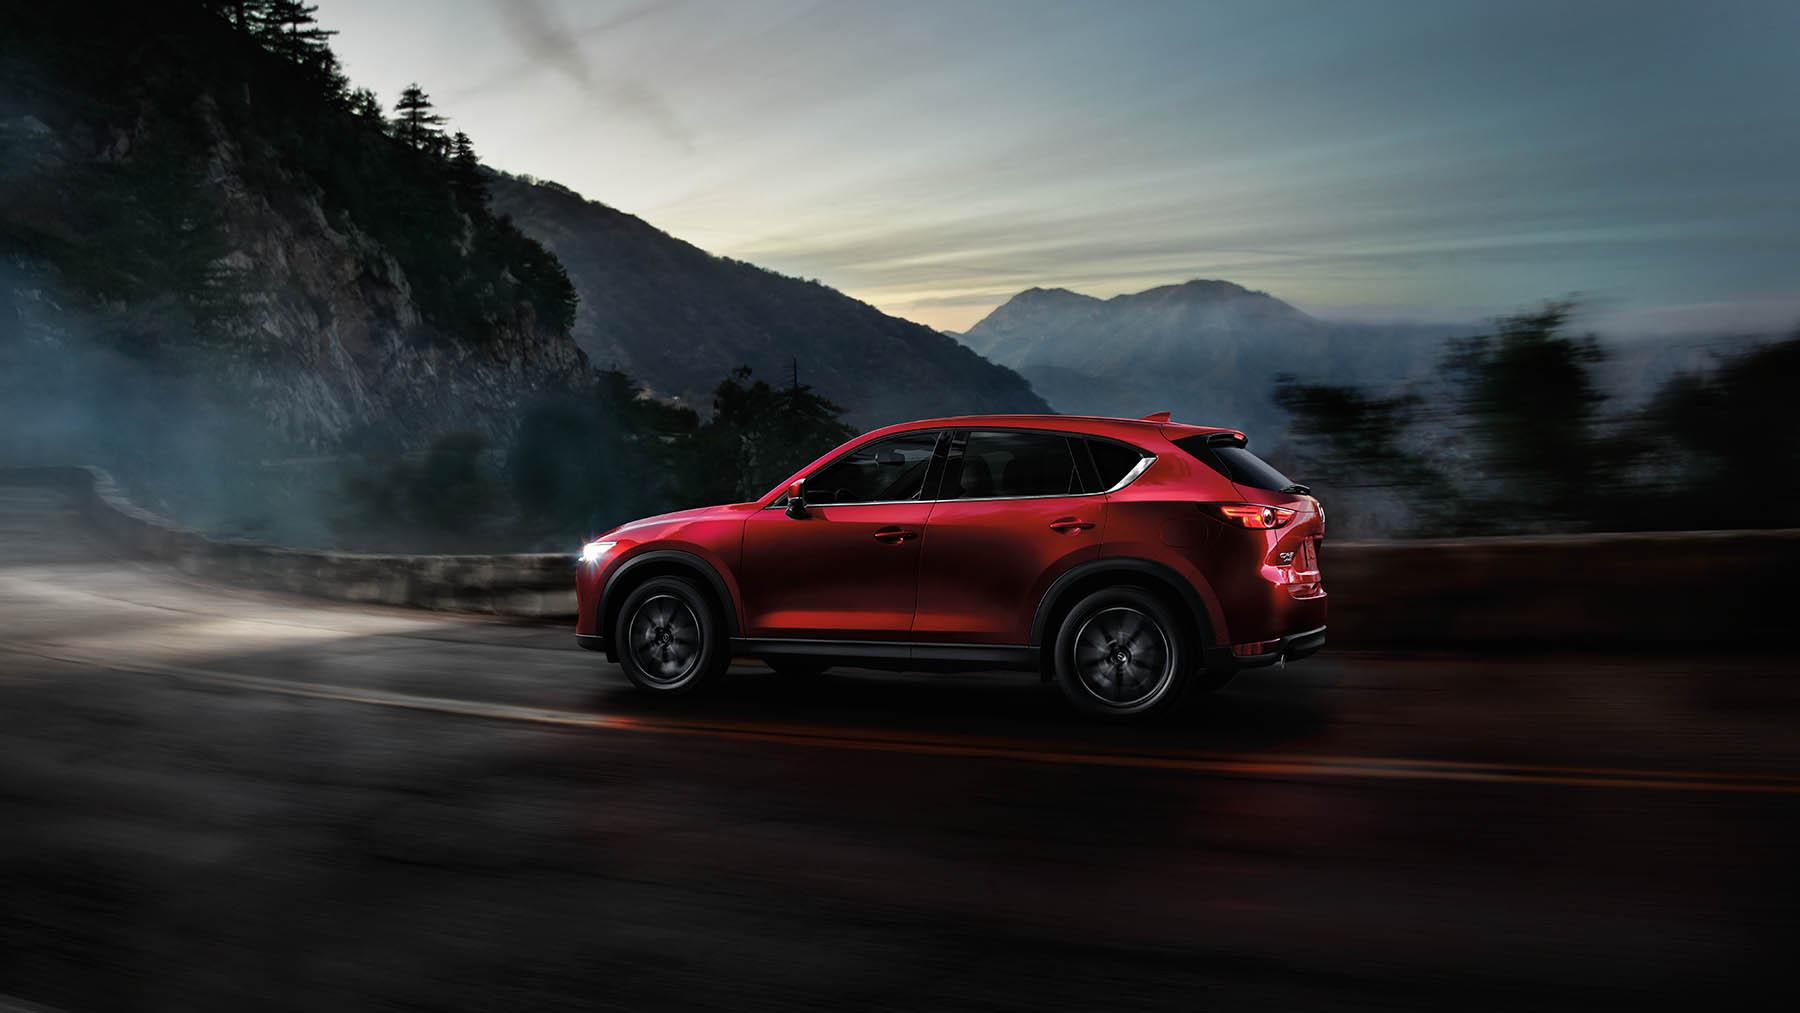 Mazda CX-5 | Drive Together